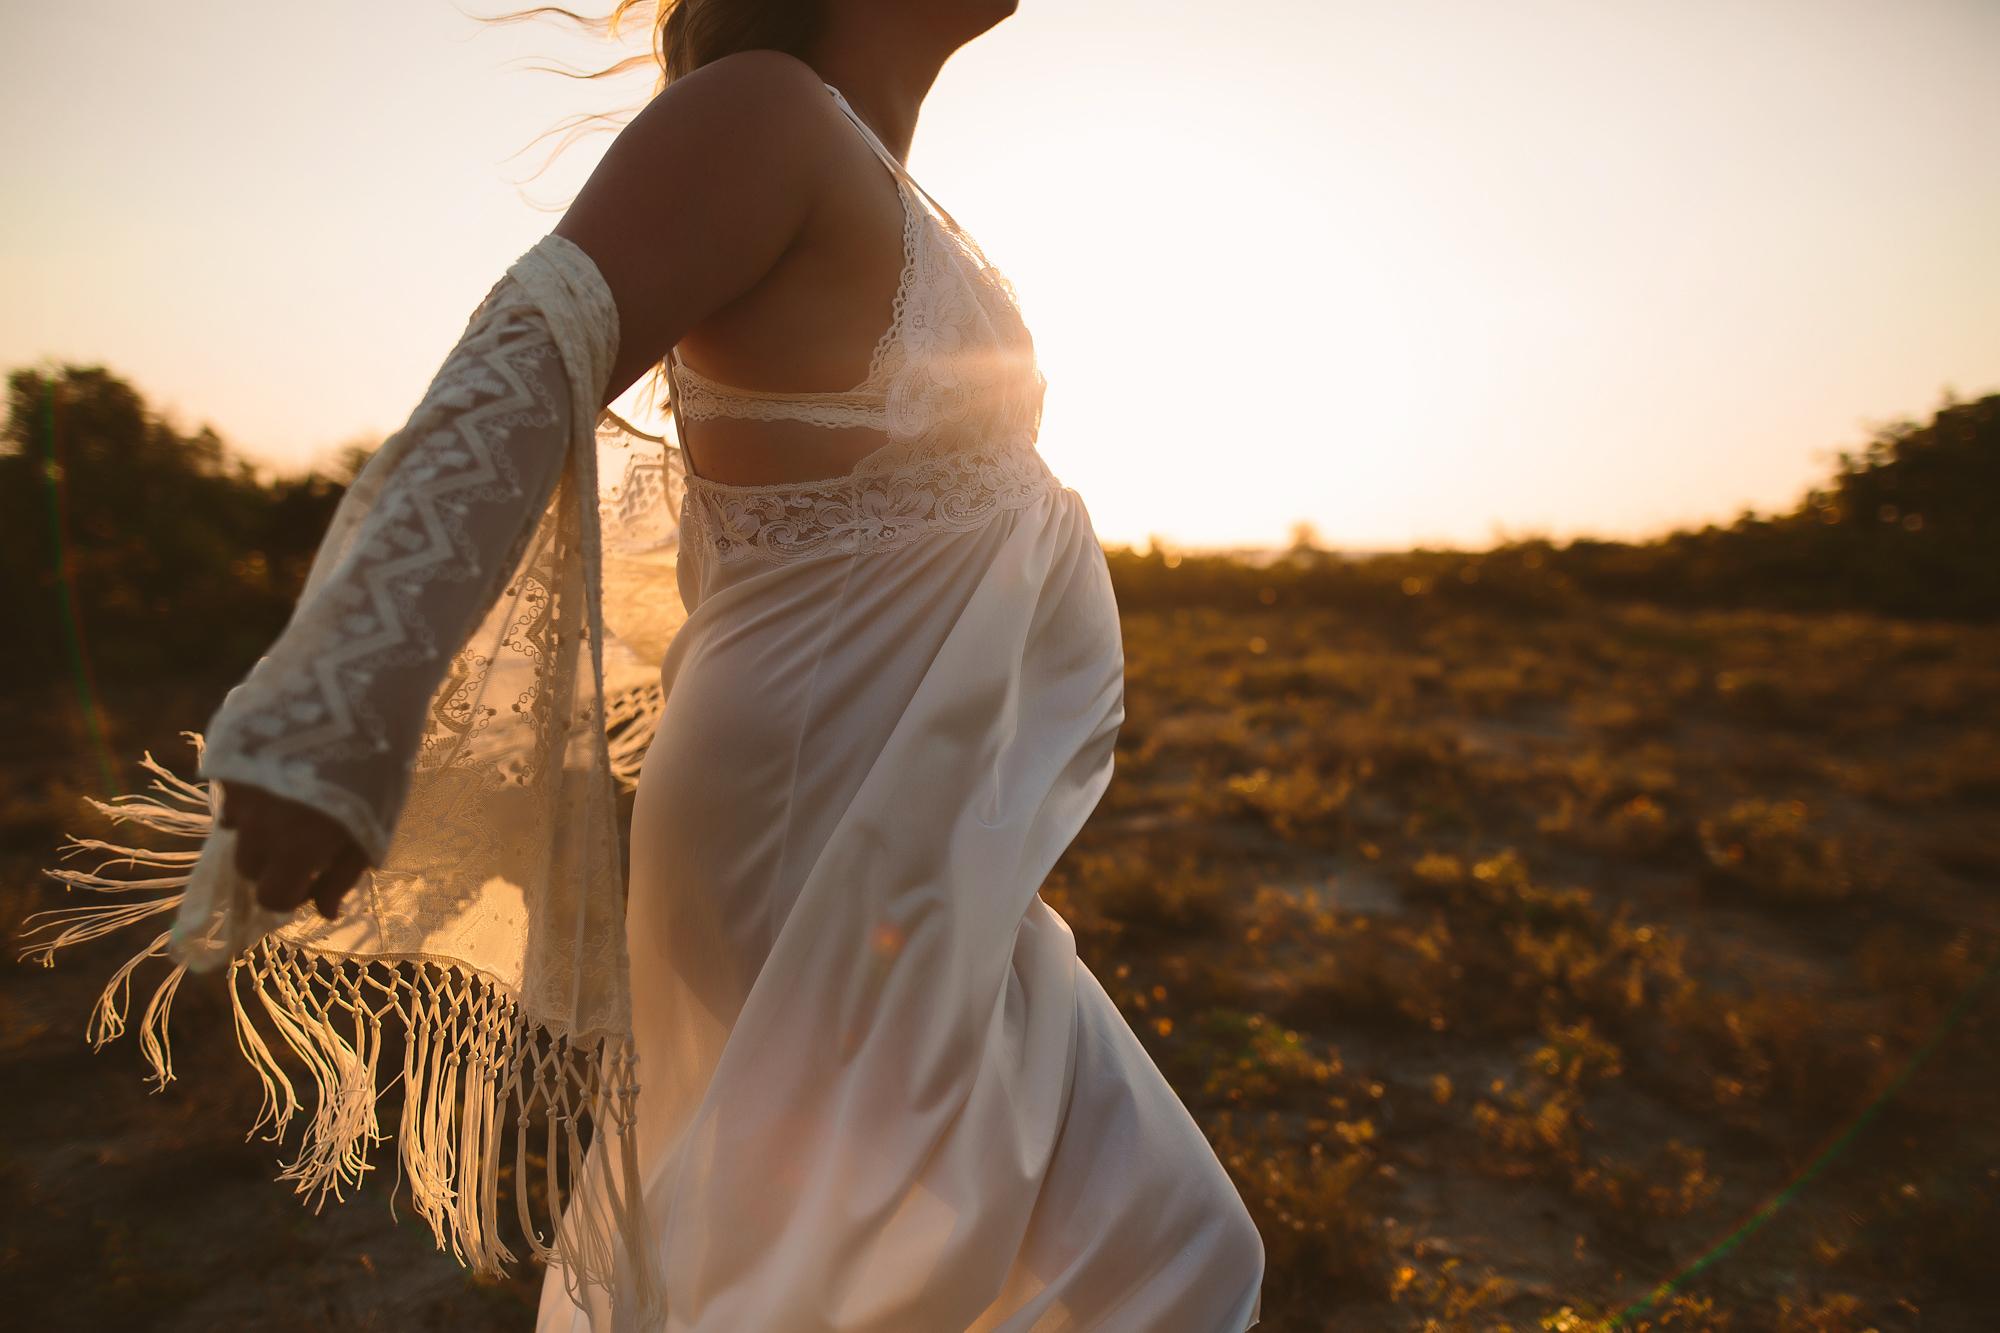 pregnancy beach photo shoot, lifestyle maternity photographer tampa